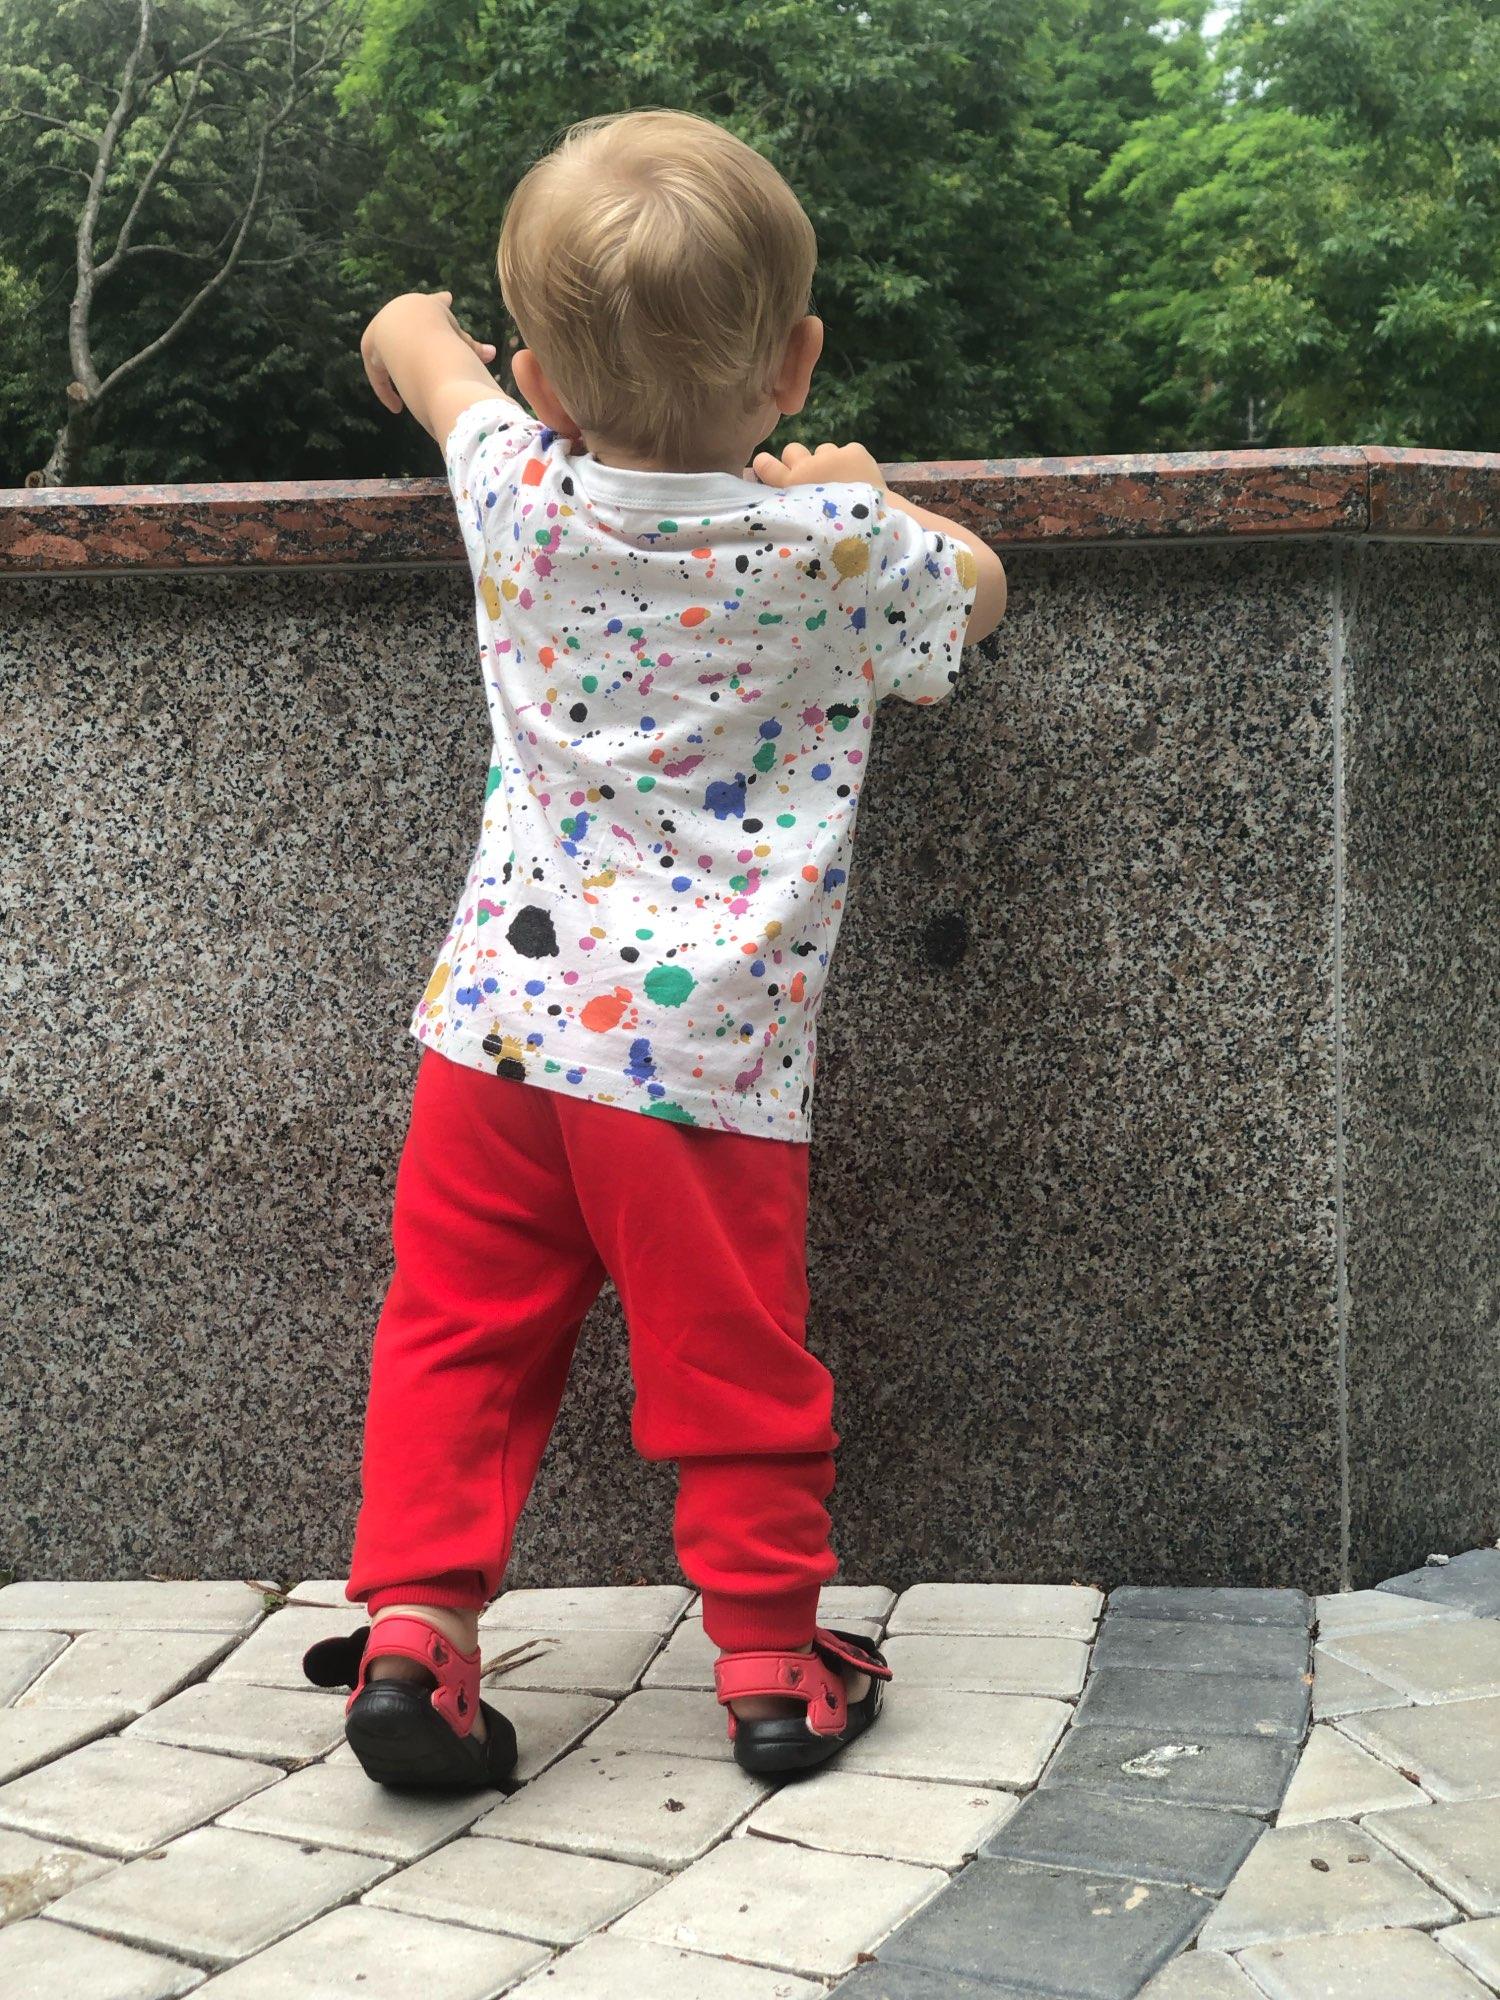 Children Autumn Winter Trousers Infant Boys Pants Toddler Loose Casual Cotton Harem Pants Soft Jogger Pants Baby Clothing 0-5y photo review